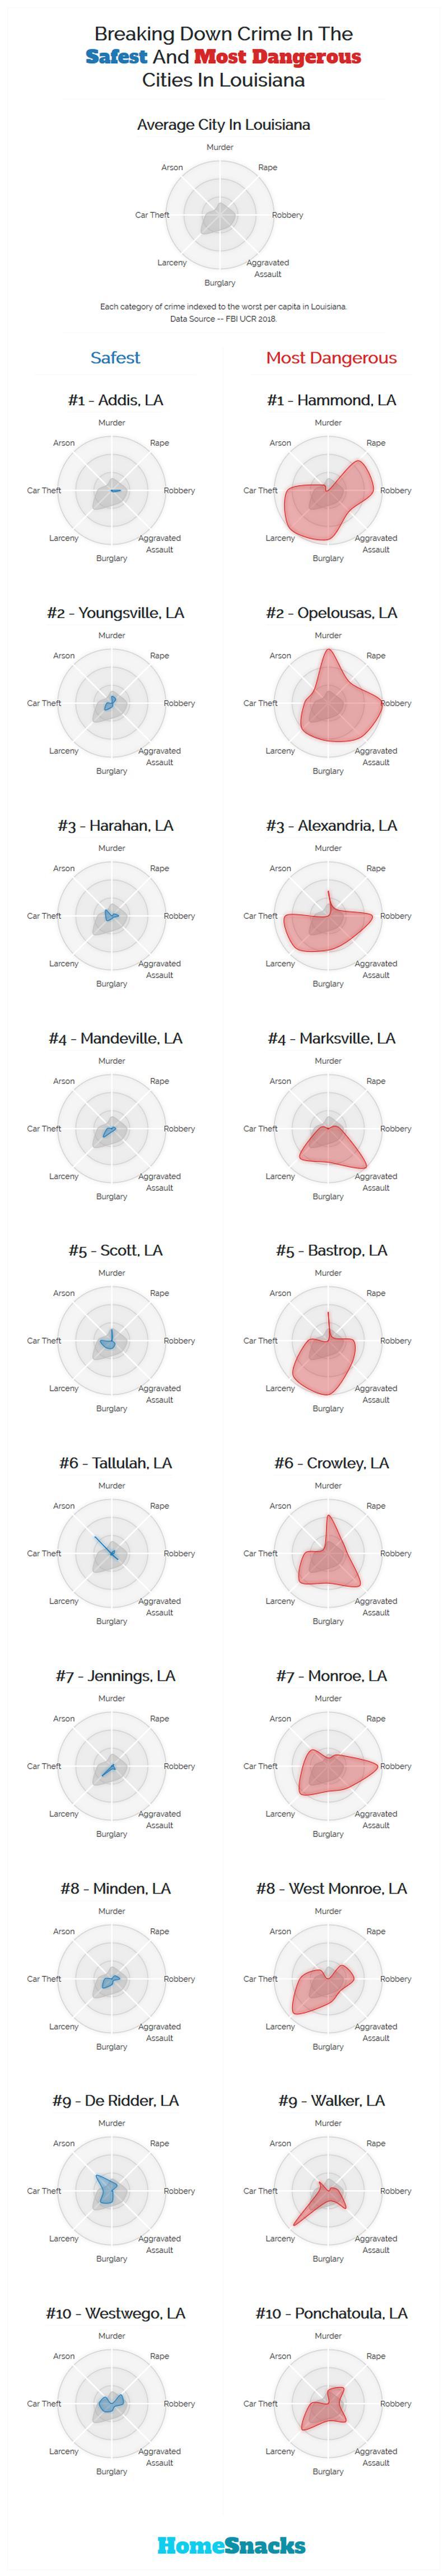 Safest Cities in Louisiana Breakdown